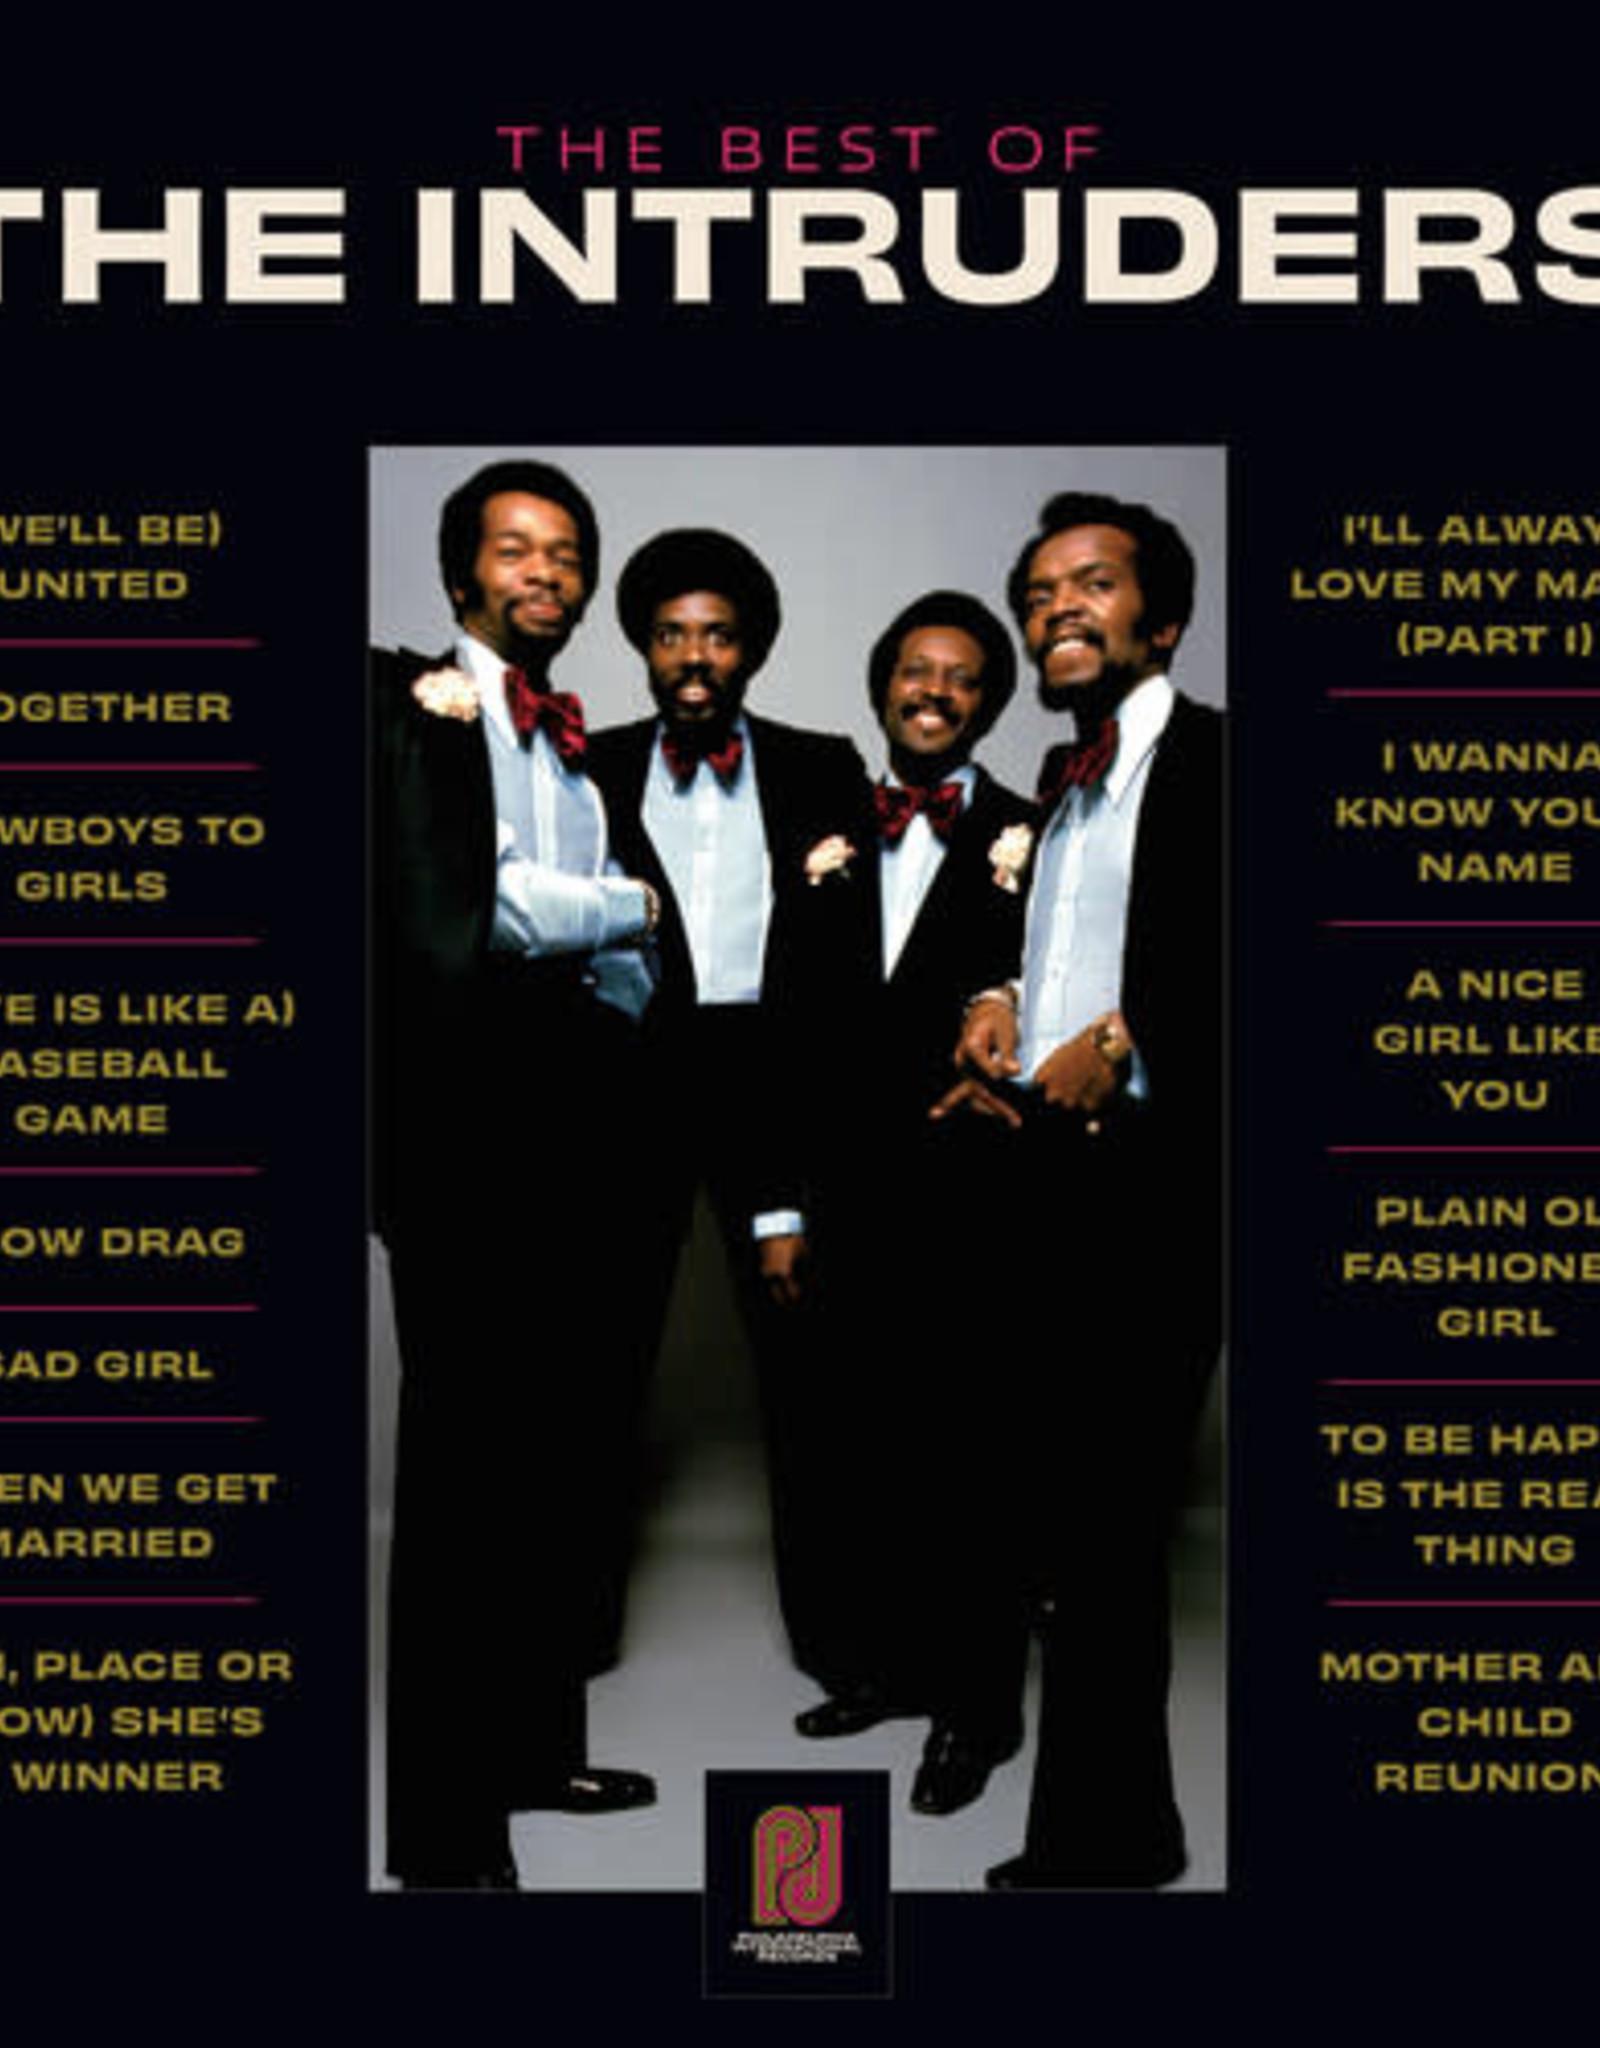 Intruders - Best of the Intruders